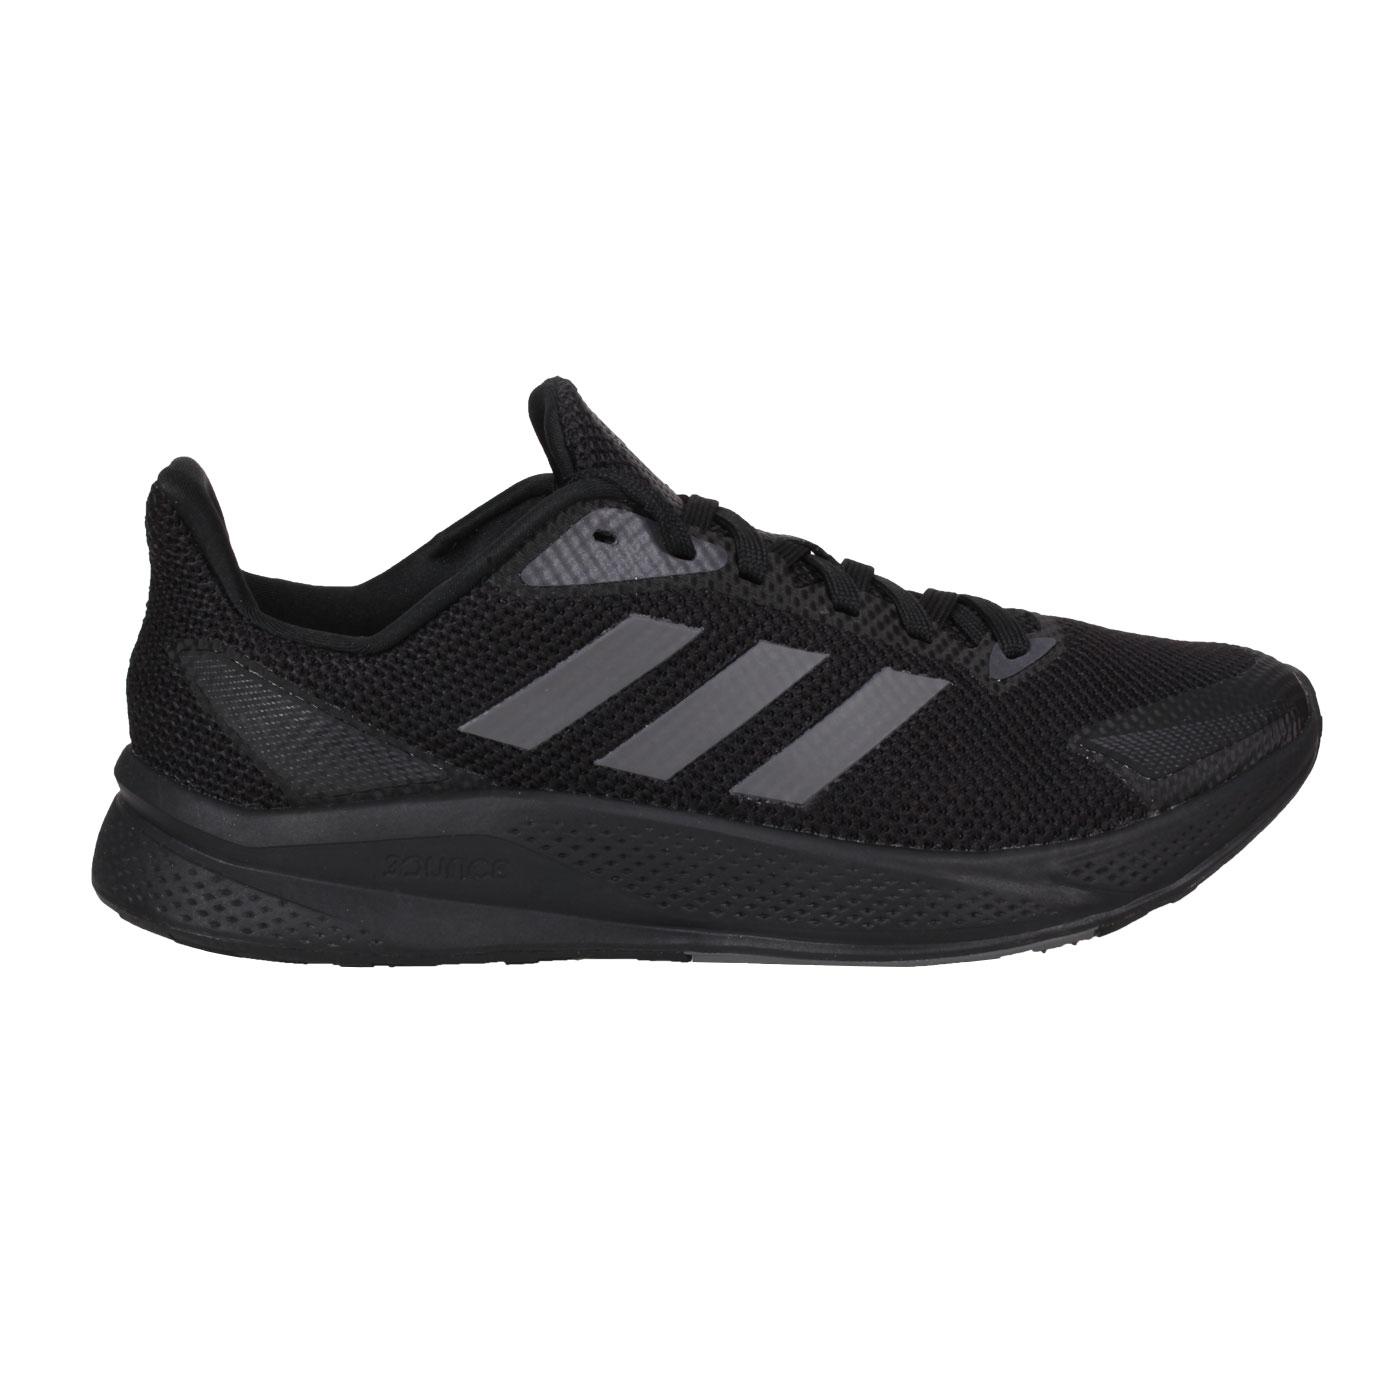 ADIDAS 男款慢跑鞋  @X9000L1 M@EH0002